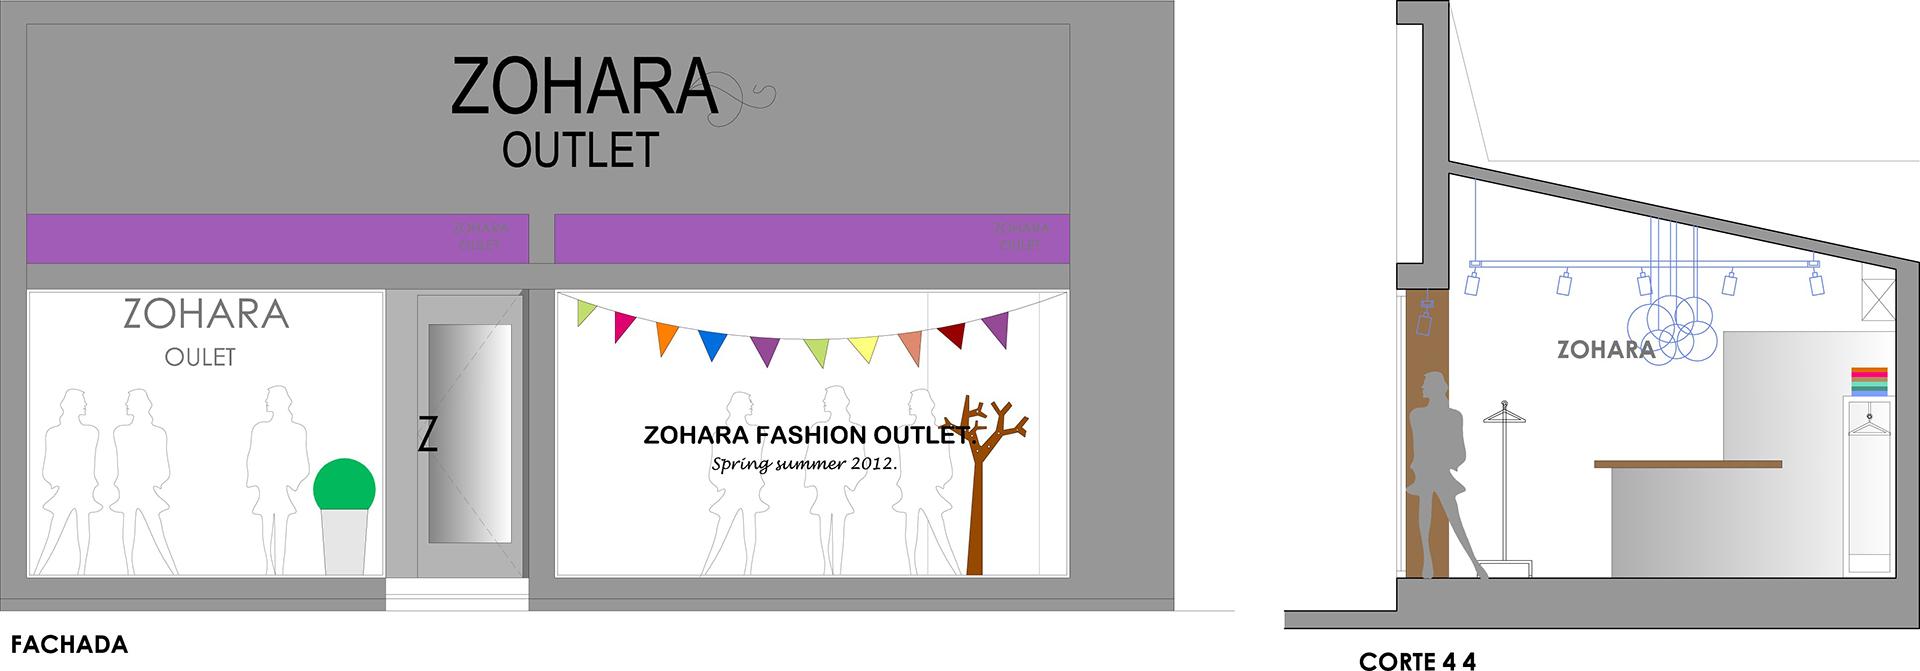 Planos Zohara Outlet